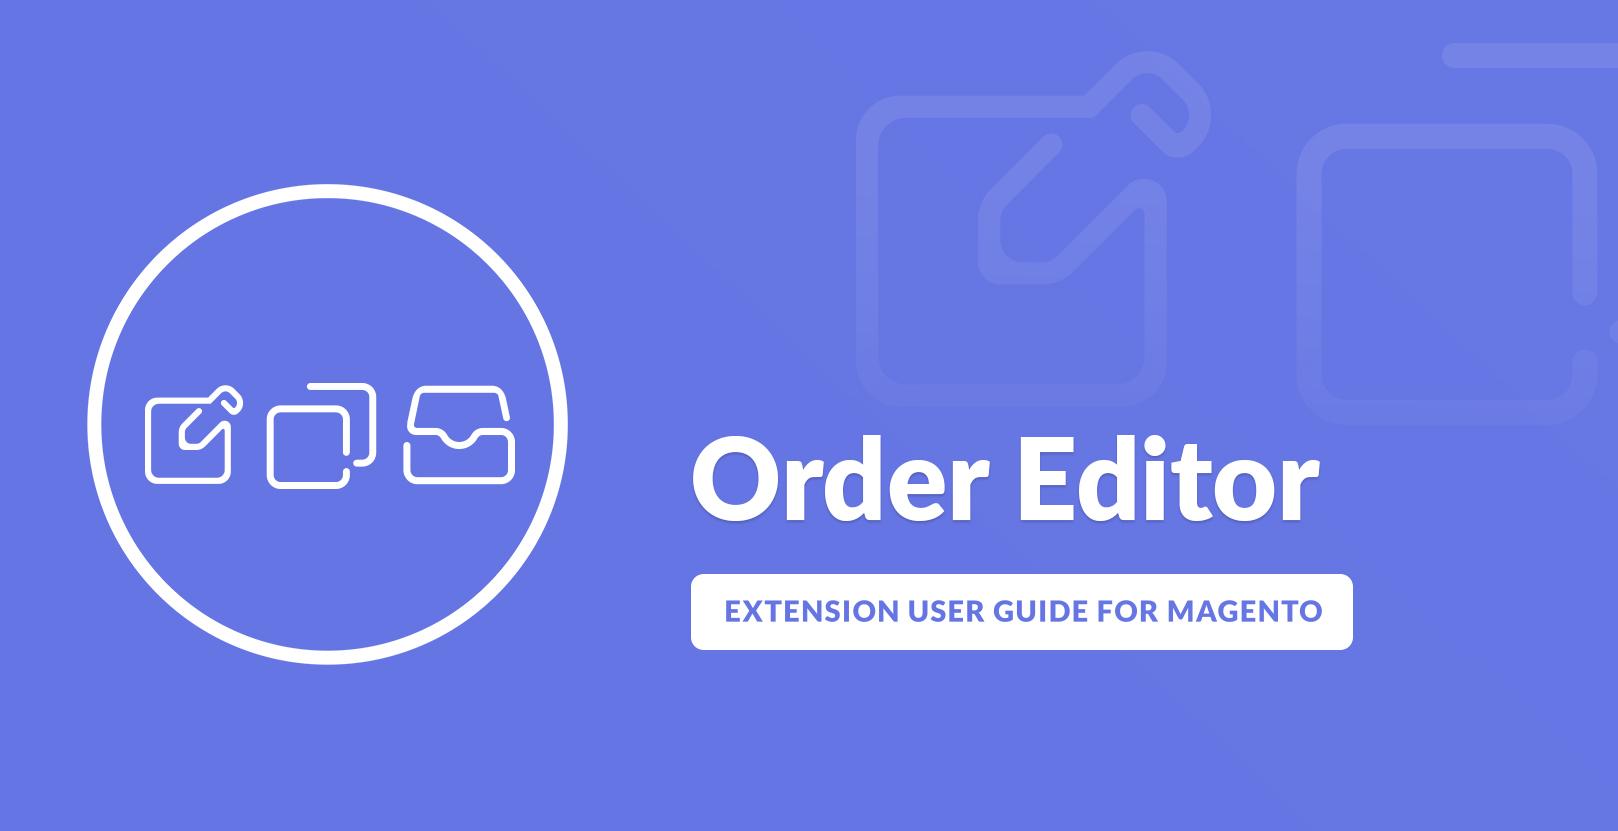 Magento 2 Order Editor User Guide